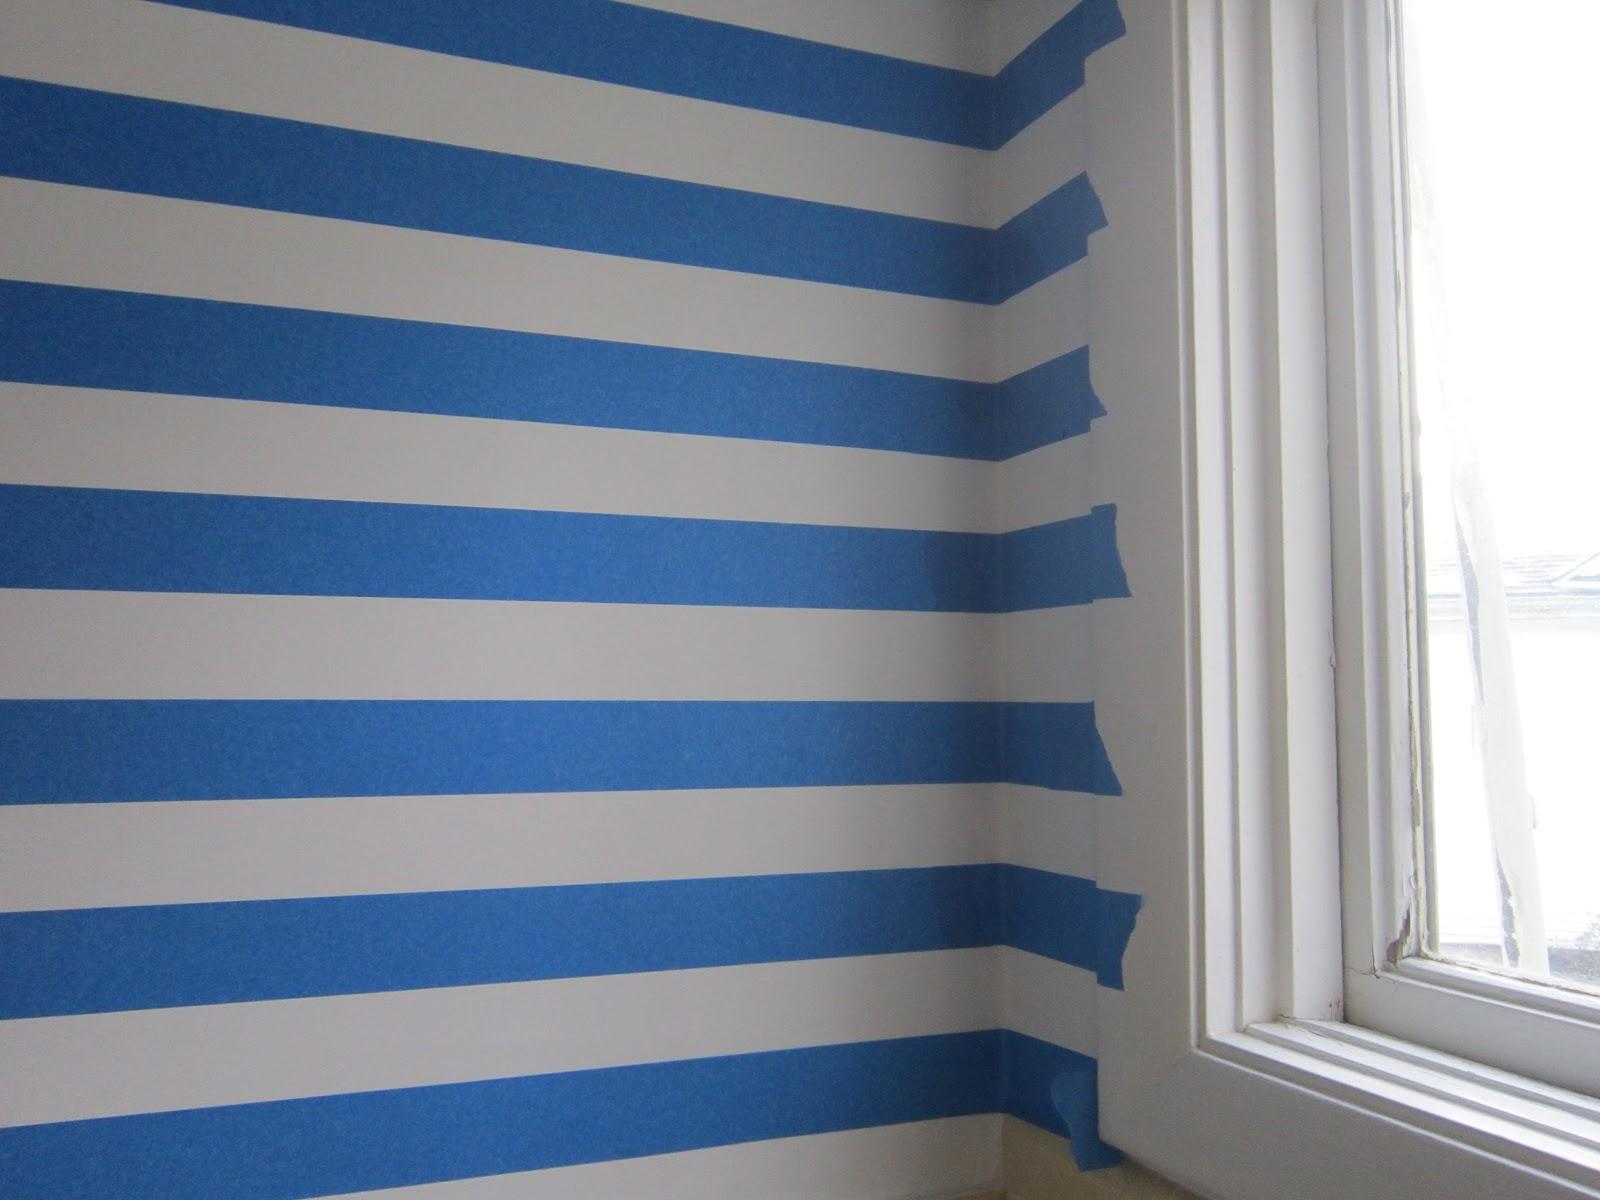 design megillah painting perfect stripes. Black Bedroom Furniture Sets. Home Design Ideas